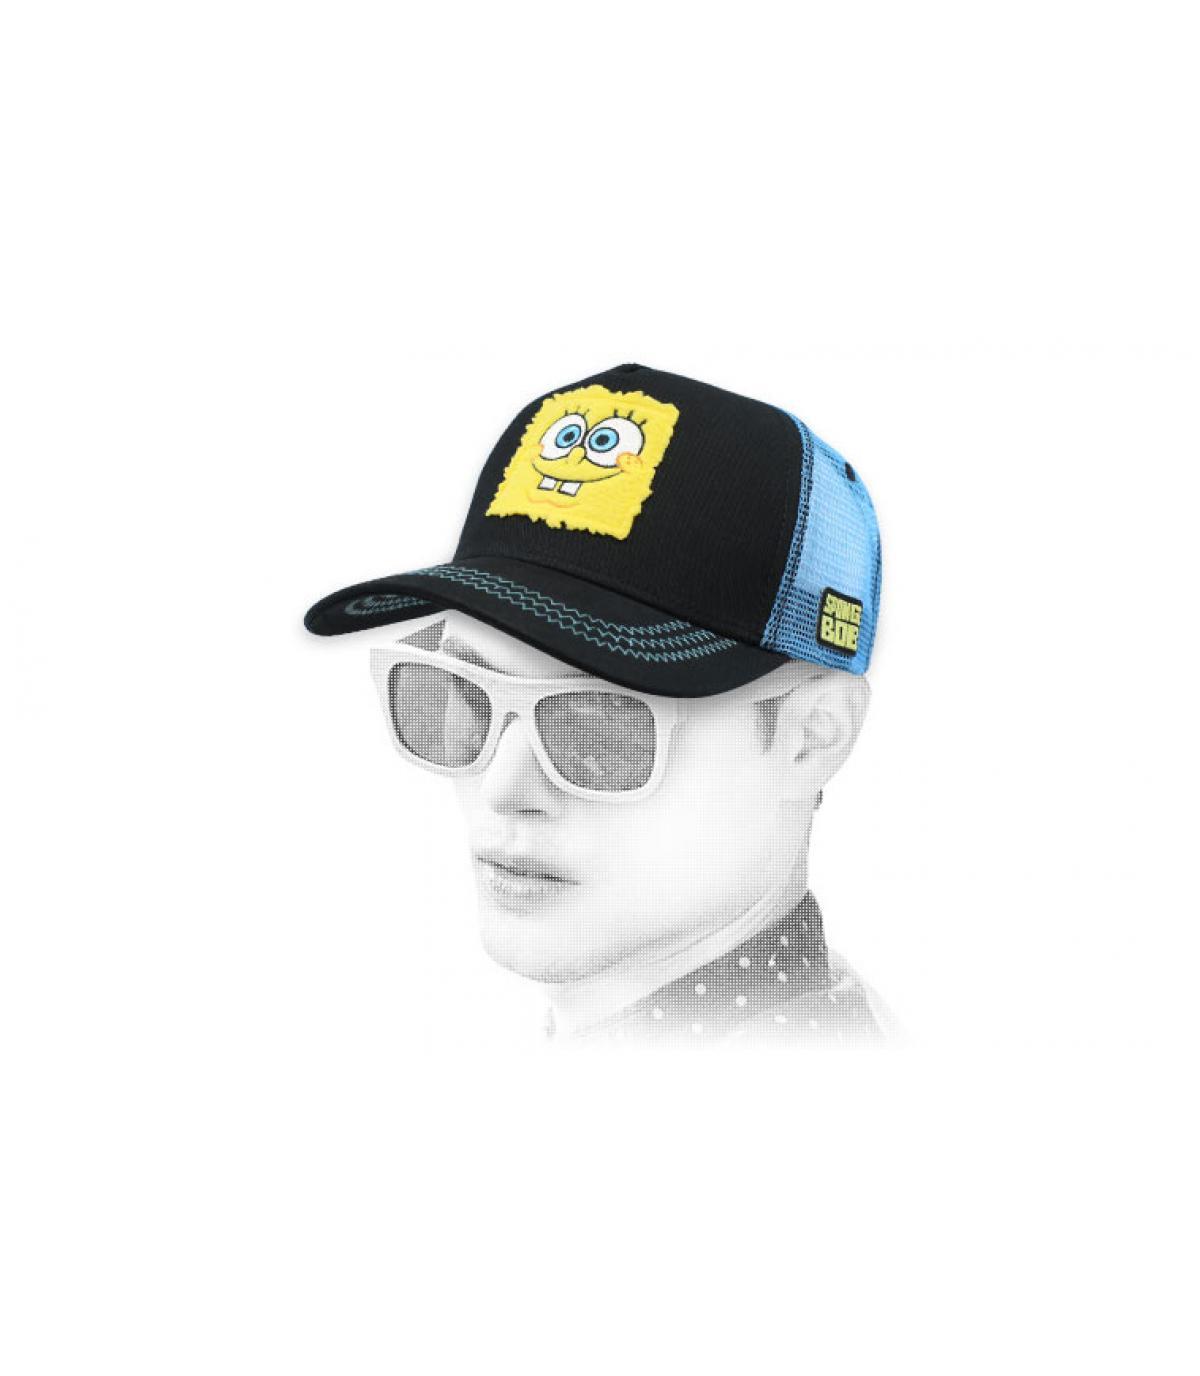 Black Sponge Bob trucker